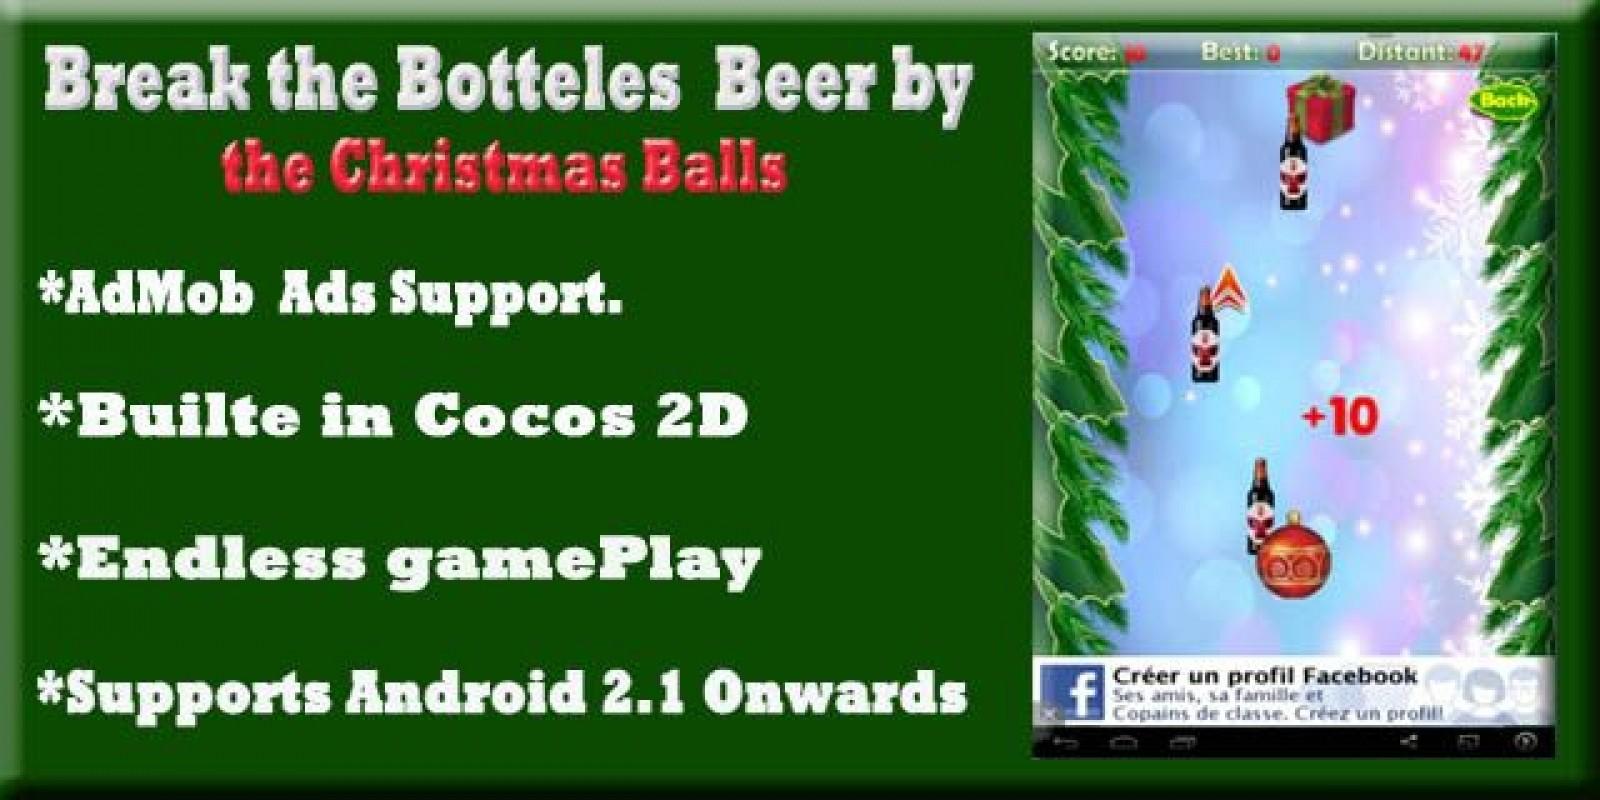 Beer Brooken Game - Android Source Code